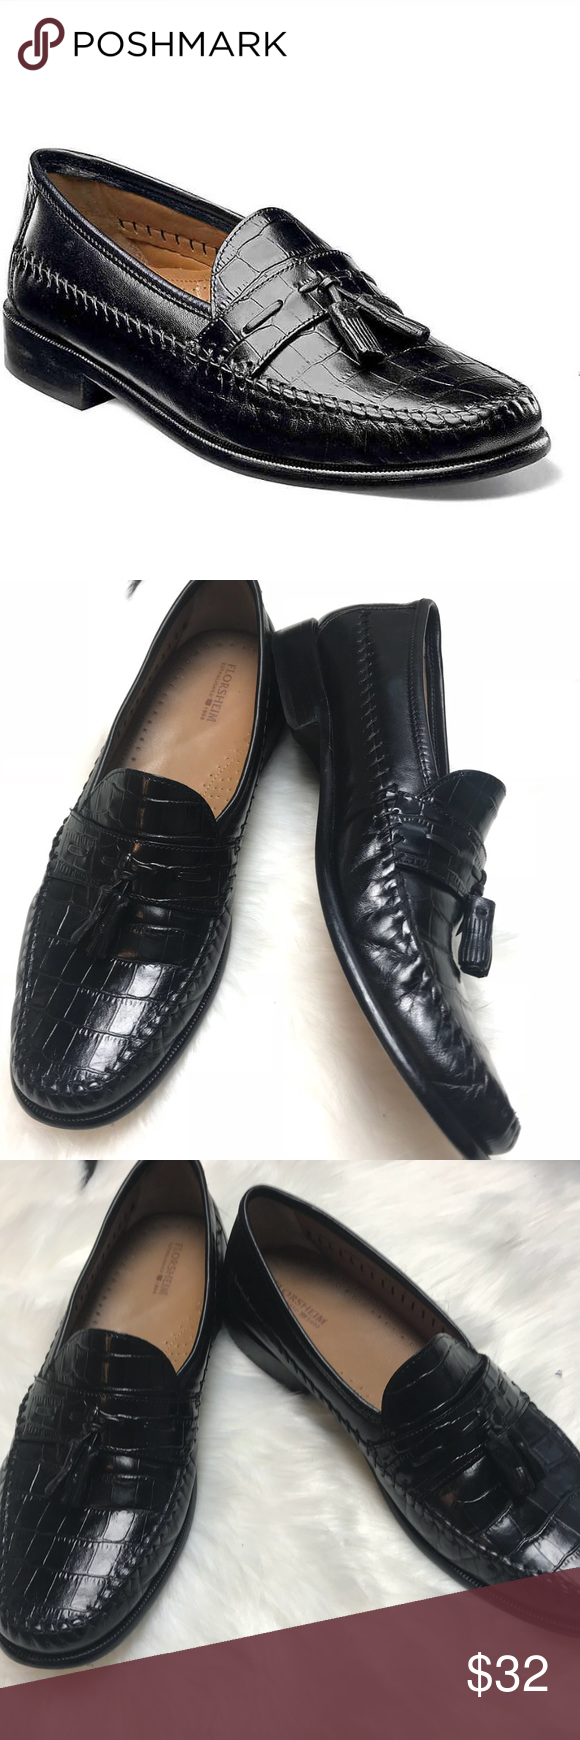 Florsheim Mens Dress Shoes Black Loafer 11 5 Dress Shoes Men Mens Black Dress Shoes Mens Dress Loafers [ 1740 x 580 Pixel ]